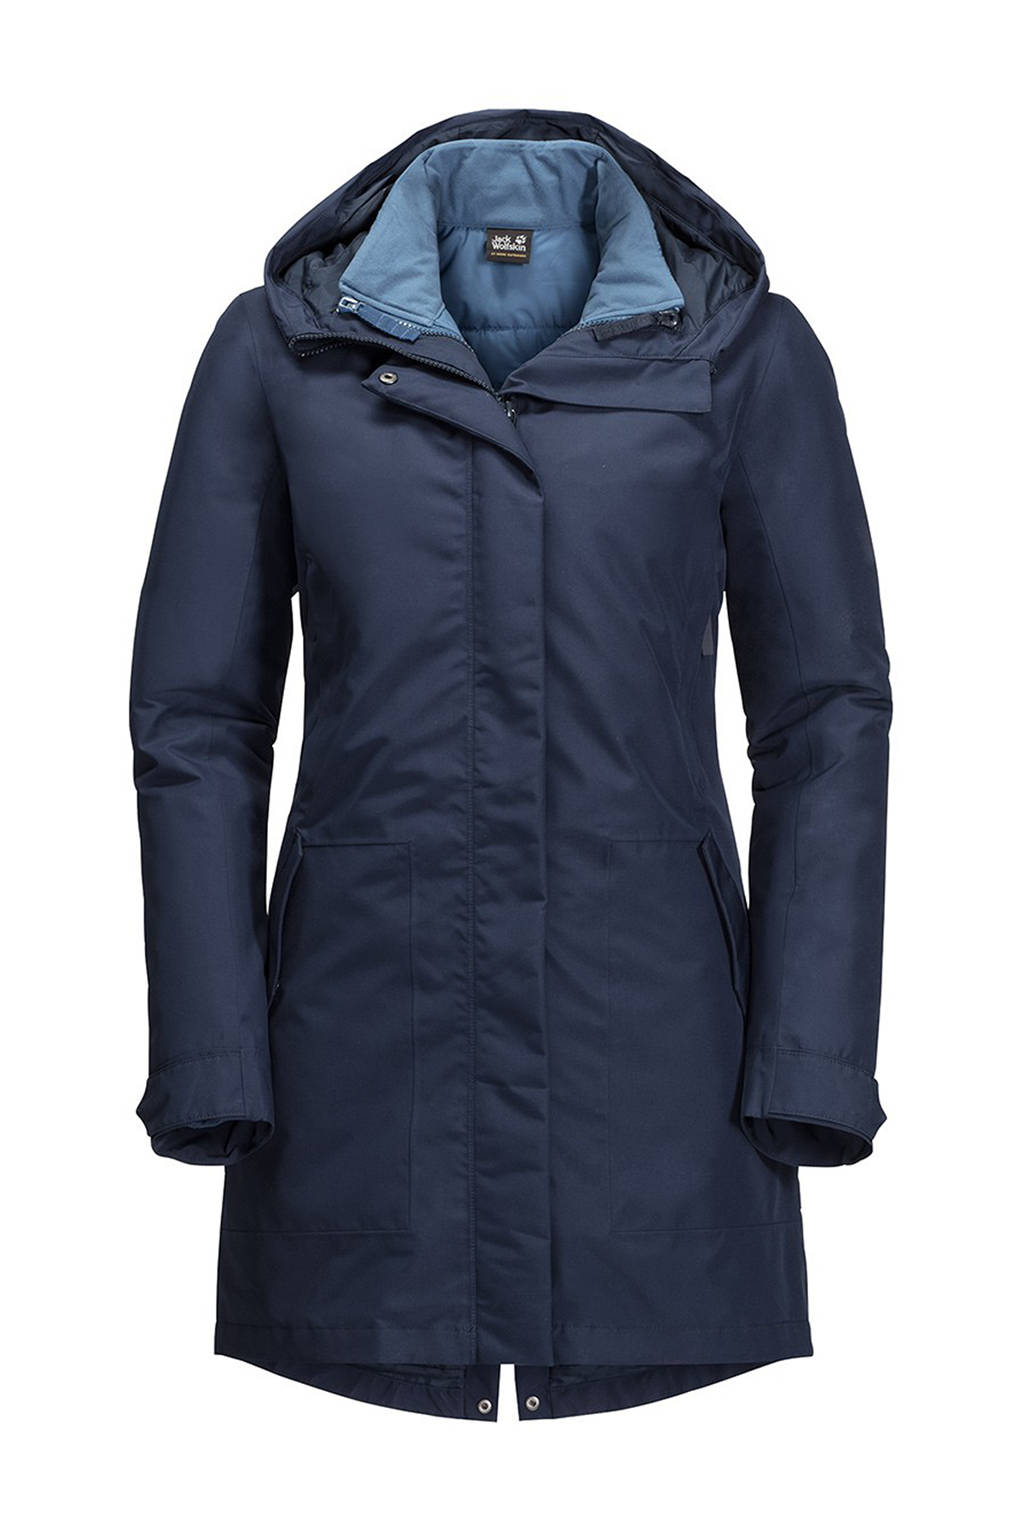 premium selection 9c702 35a33 3-in-1 outdoor parka Monterey Bay blauw